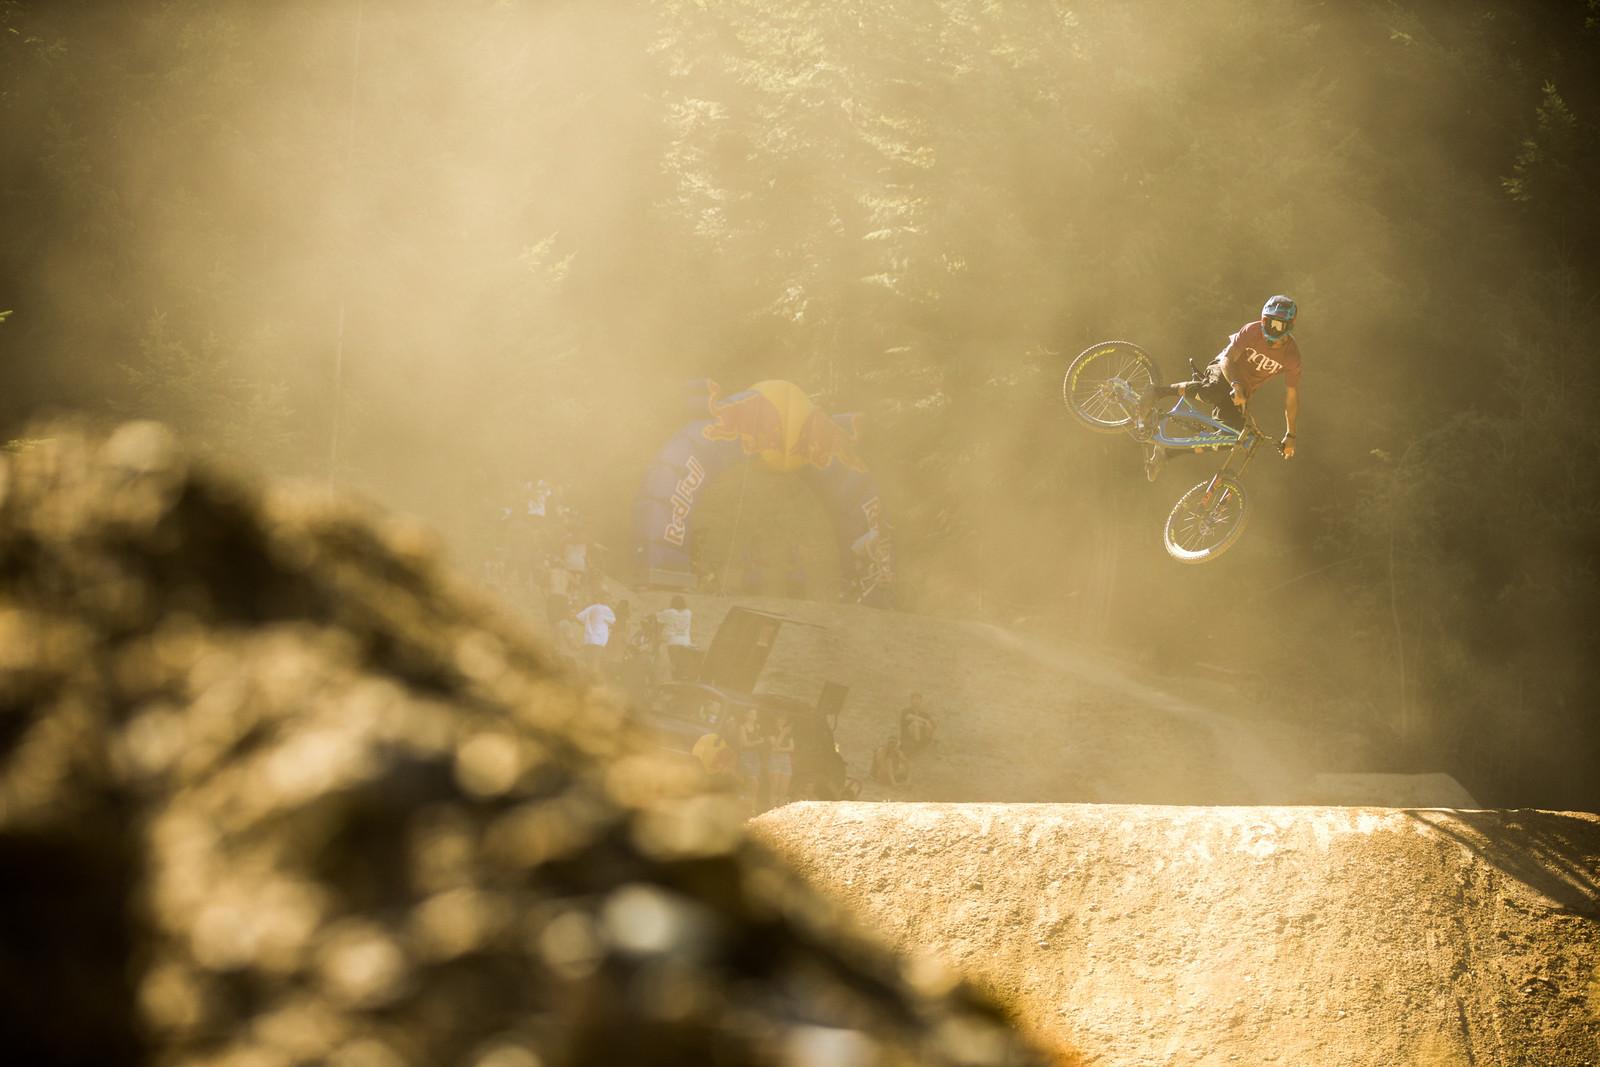 Eddie Masters - McGazza Fest Dream Track Jam - Mountain Biking Pictures - Vital MTB